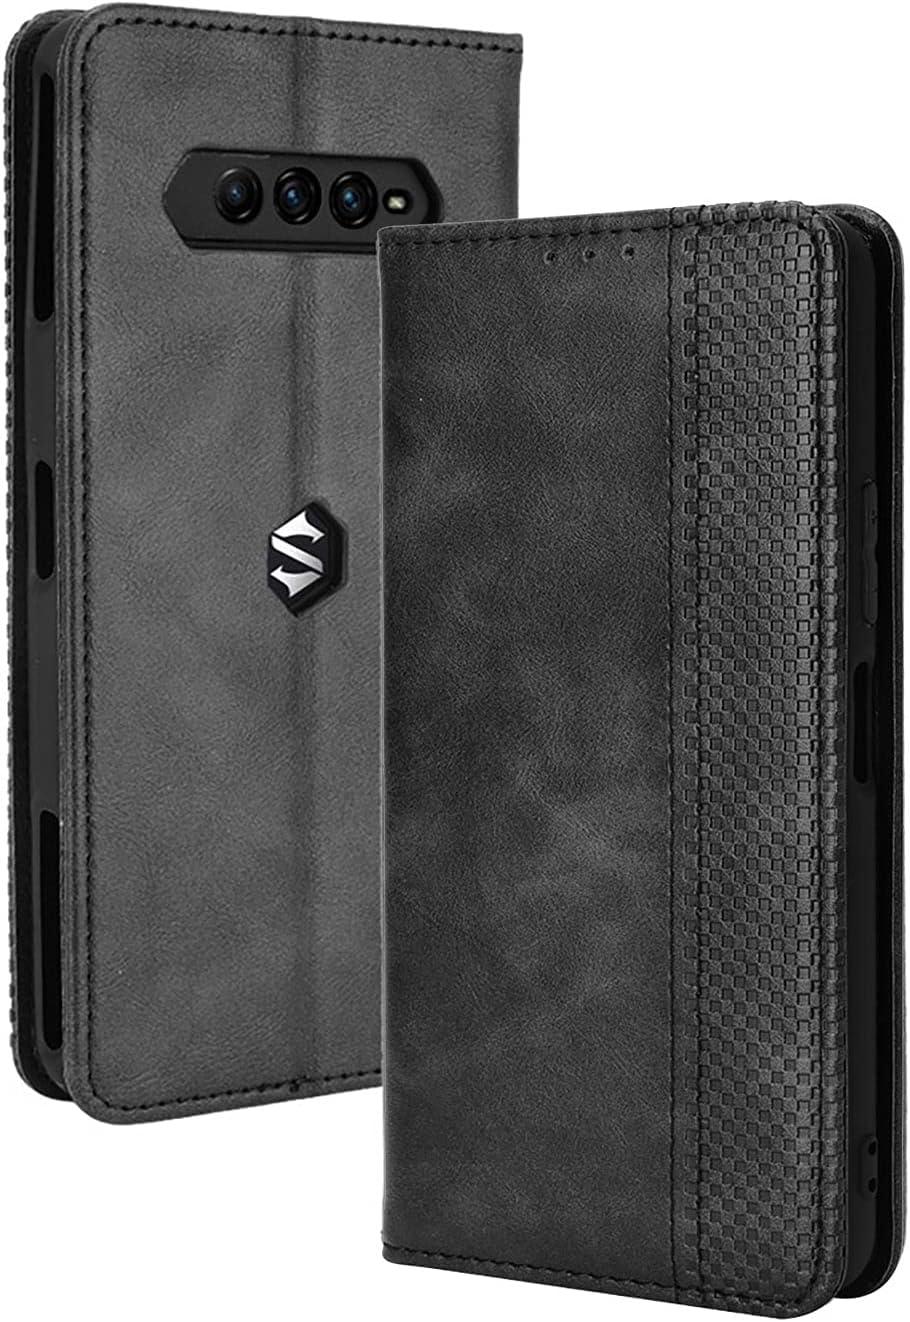 GOKEN Funda para Xiaomi Black Shark 4 Pro/Black Shark 4 Funda, Leather Folio Carcasa con Billetera, Magnética Premium PU/TPU Cuero FILP Case Cover con Soporte/Tapa Tarjetas (Negro)